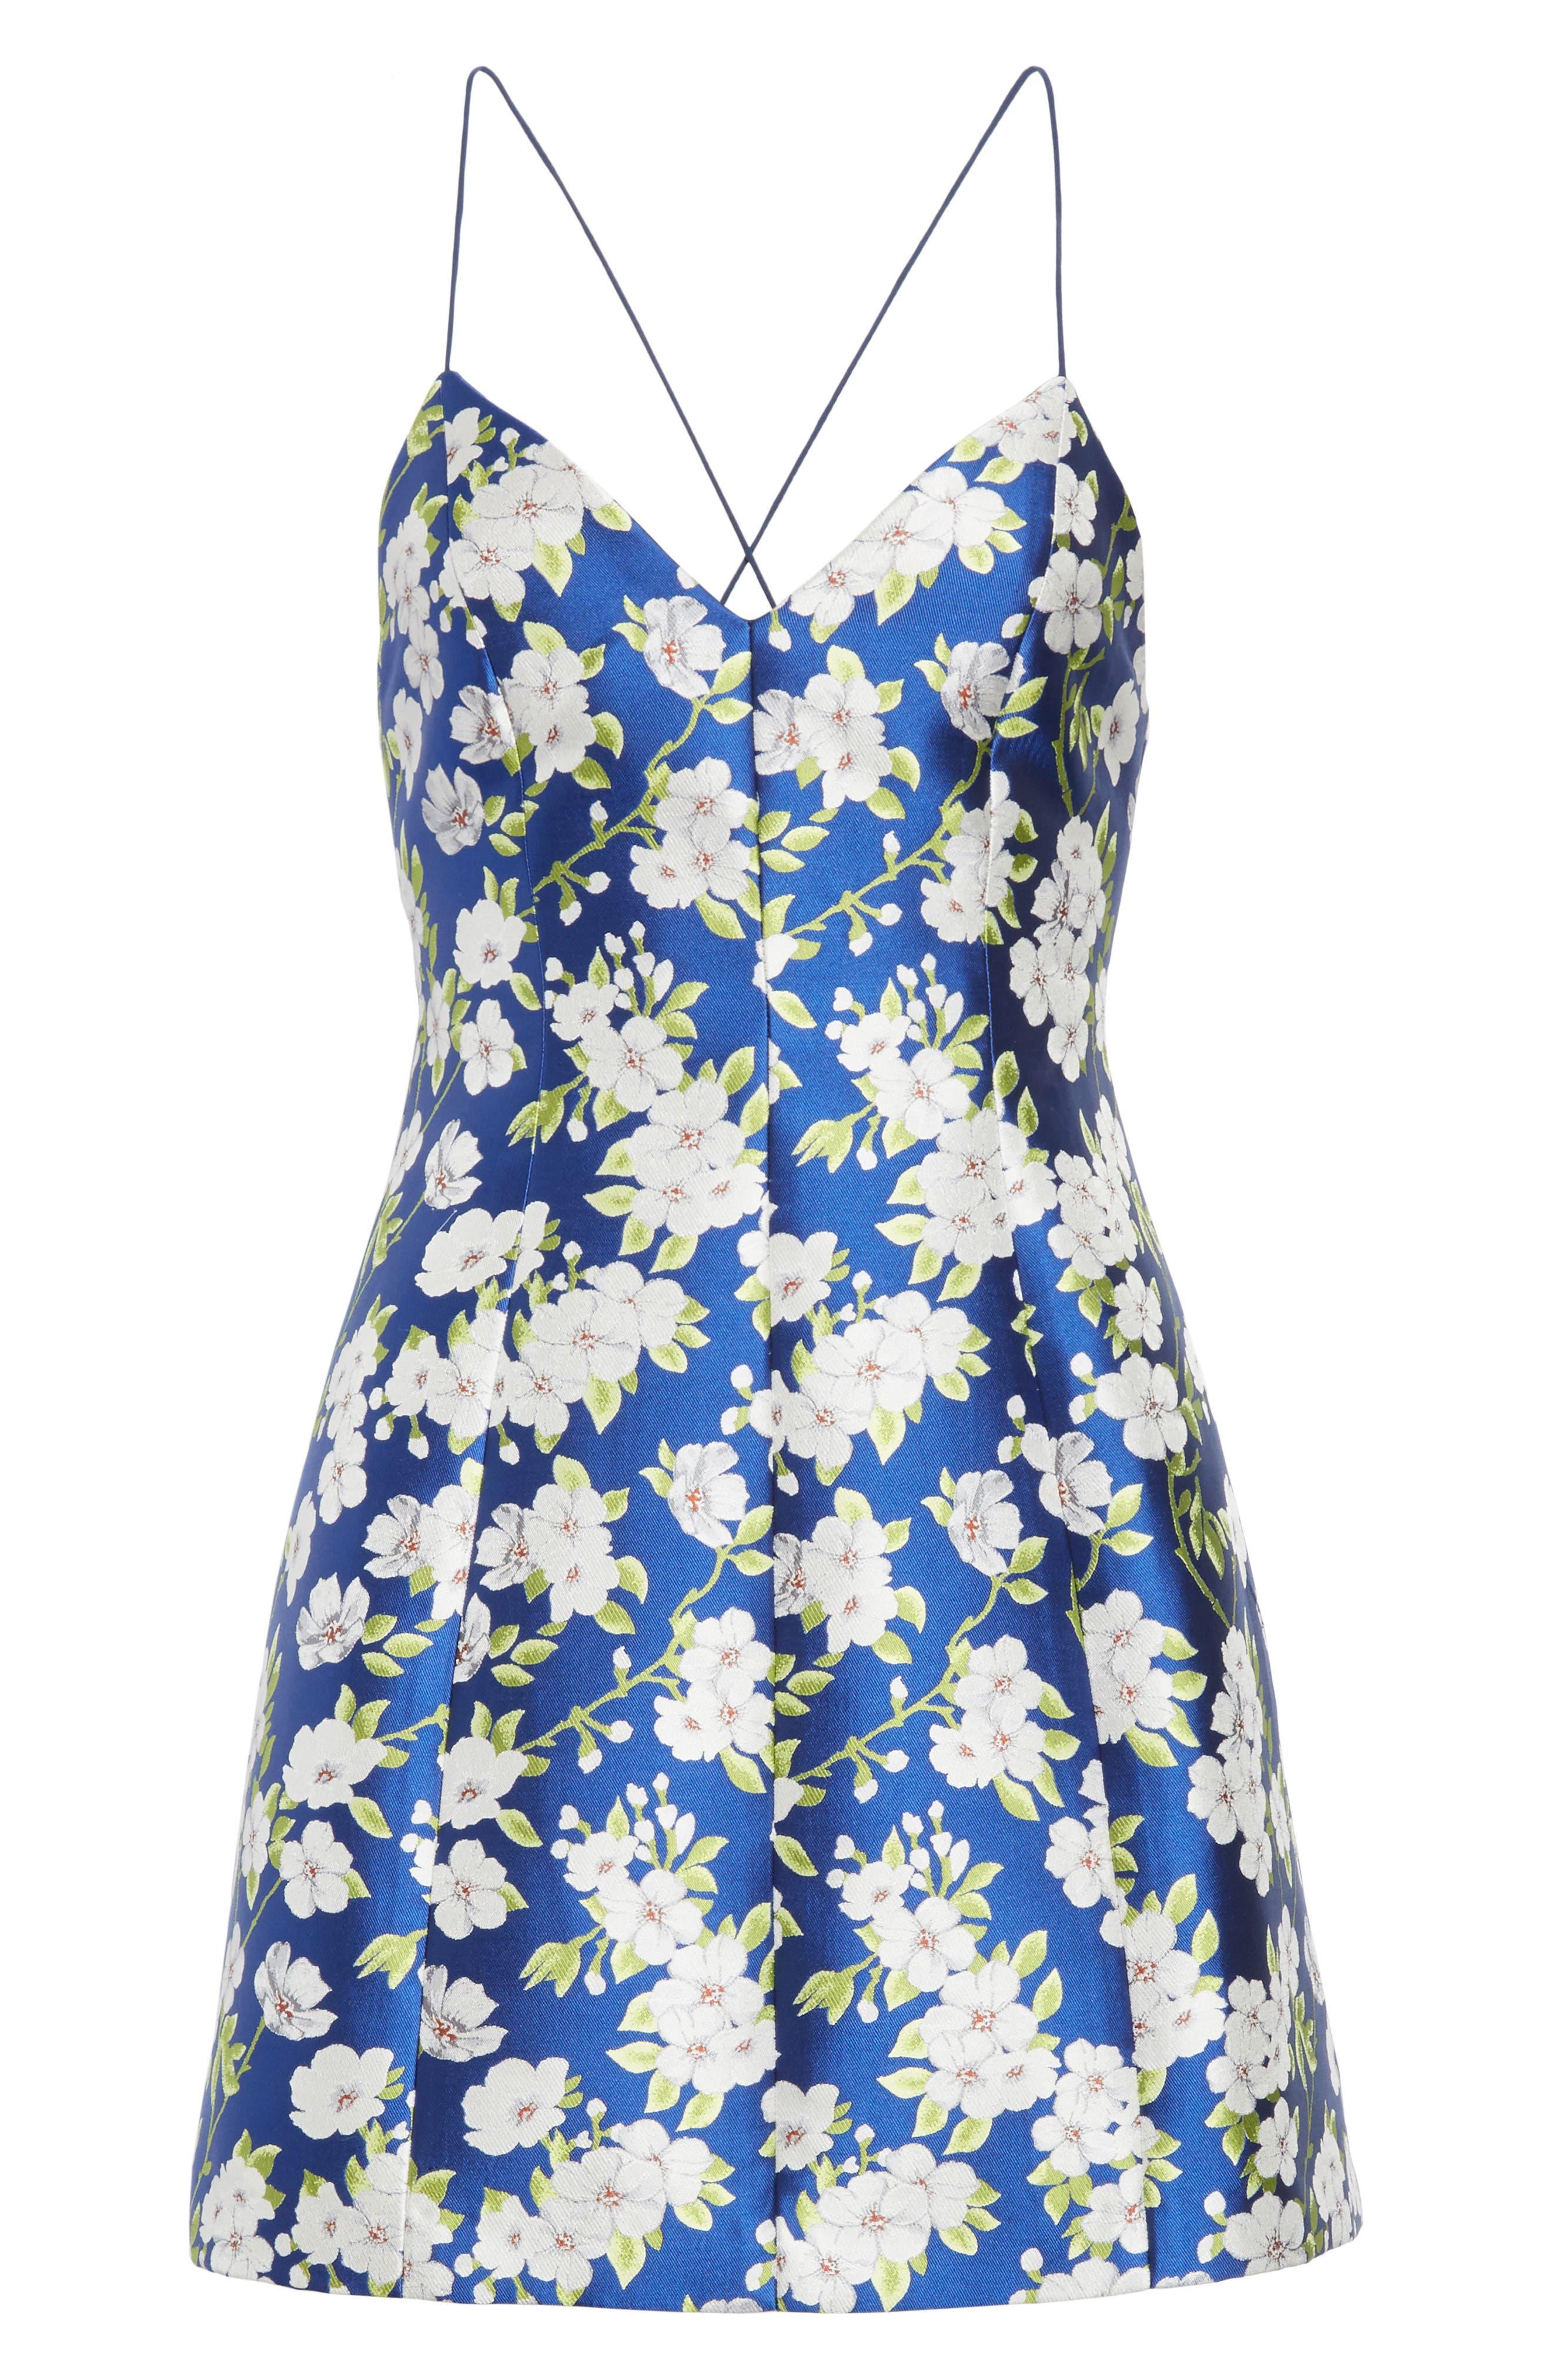 Tayla Structured Lantern Mini Dress,                             Alternate thumbnail 6, color,                             Indigo/ White